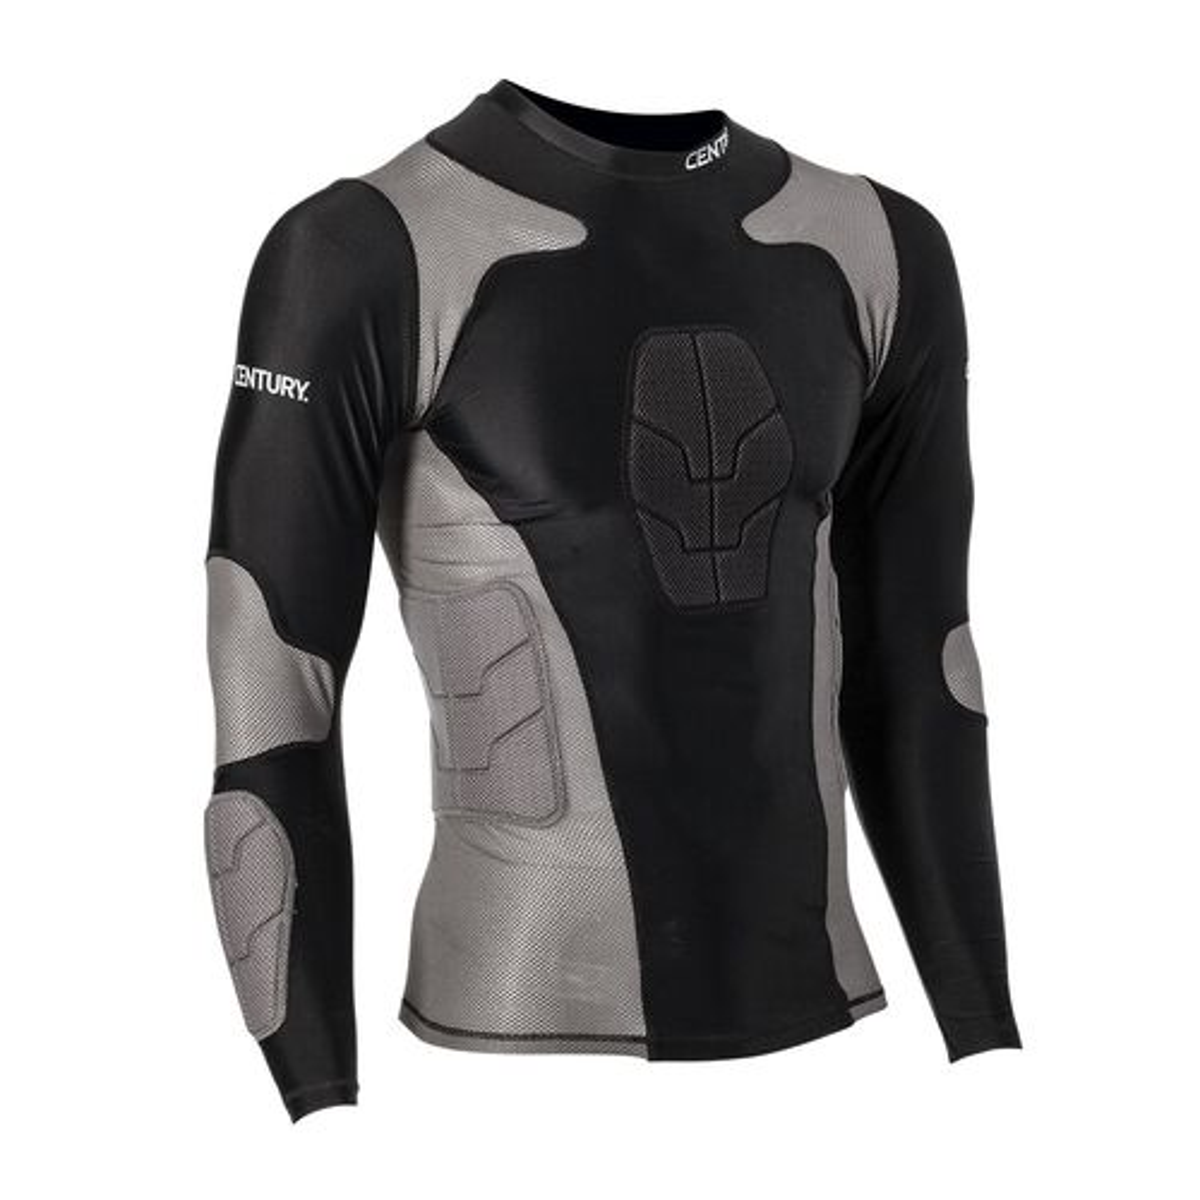 Century® Kids' Long Sleeve Padded Compression Shirt